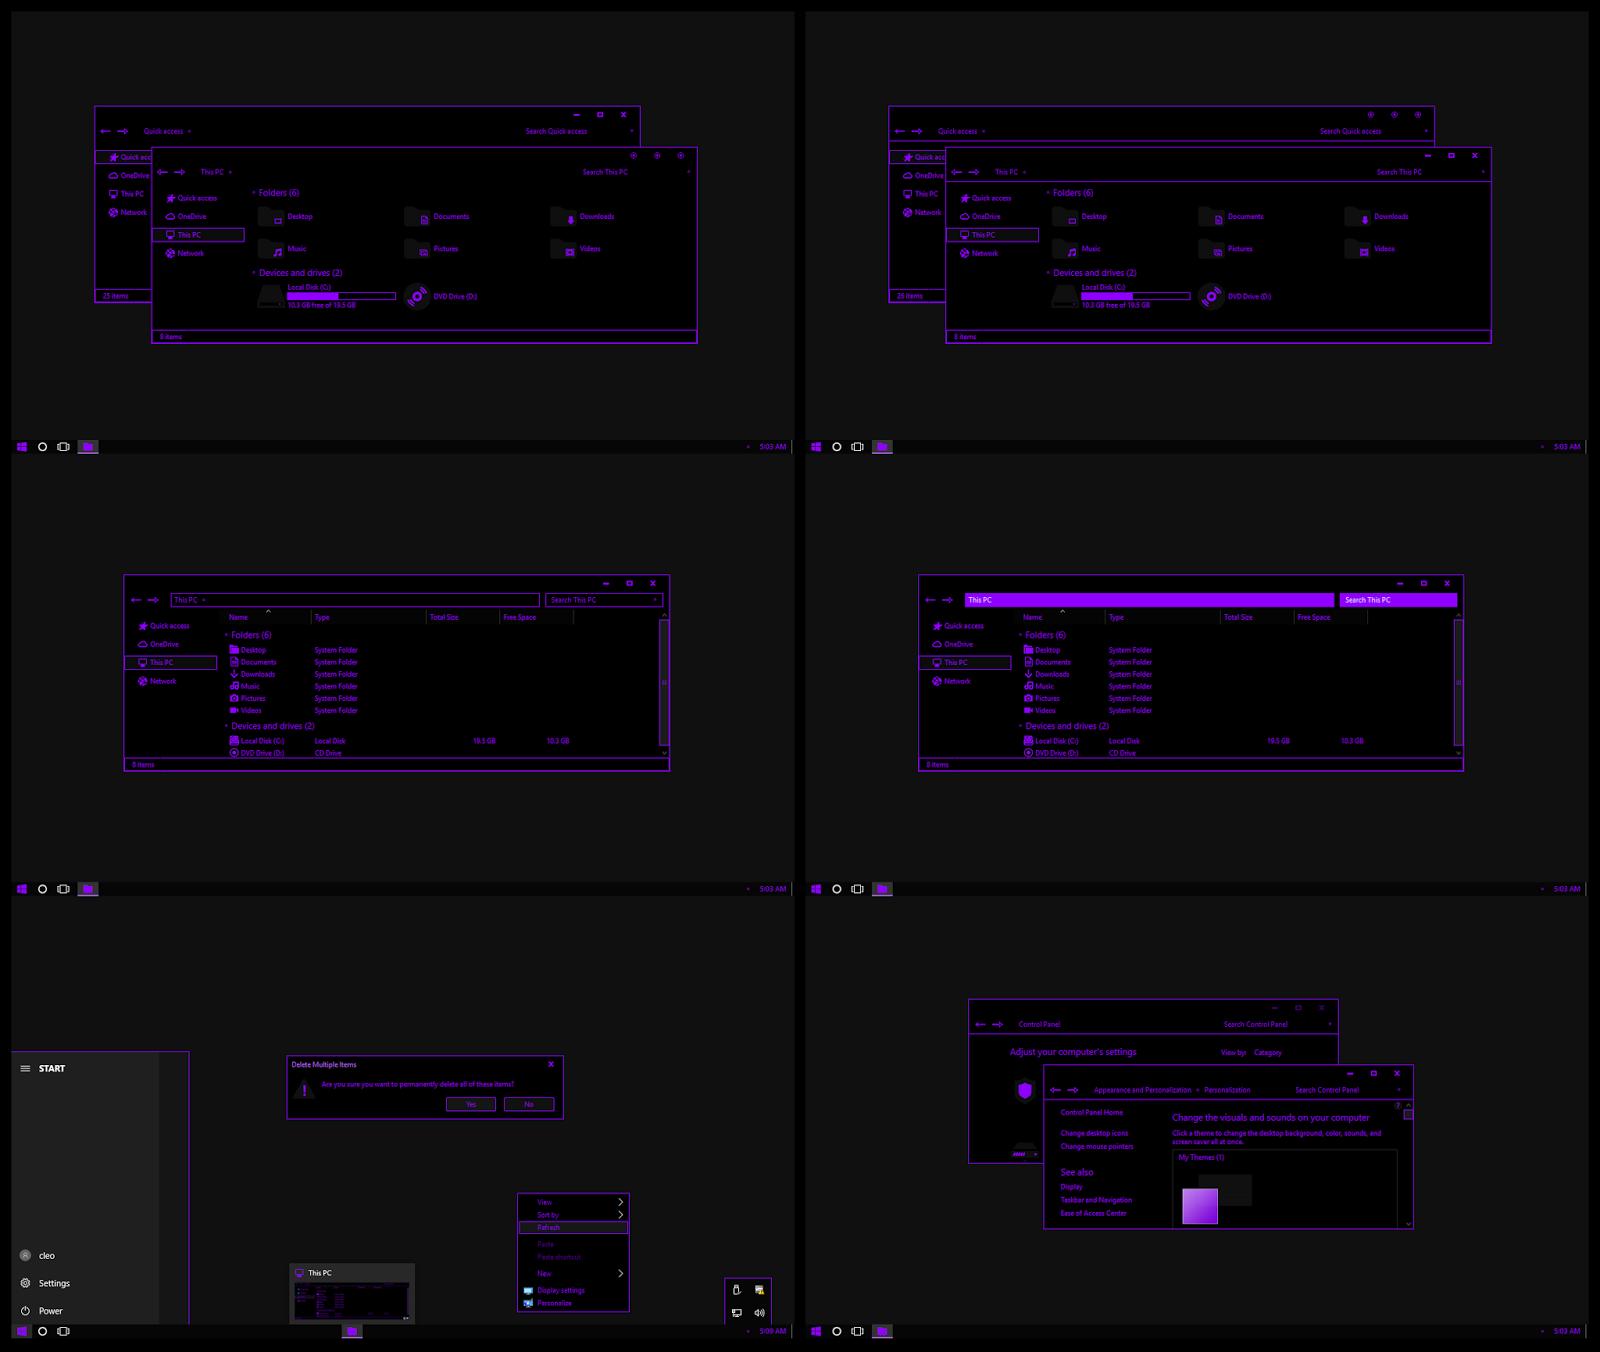 Pure Black Purple Neon Theme Windows10 Creators Update 1703